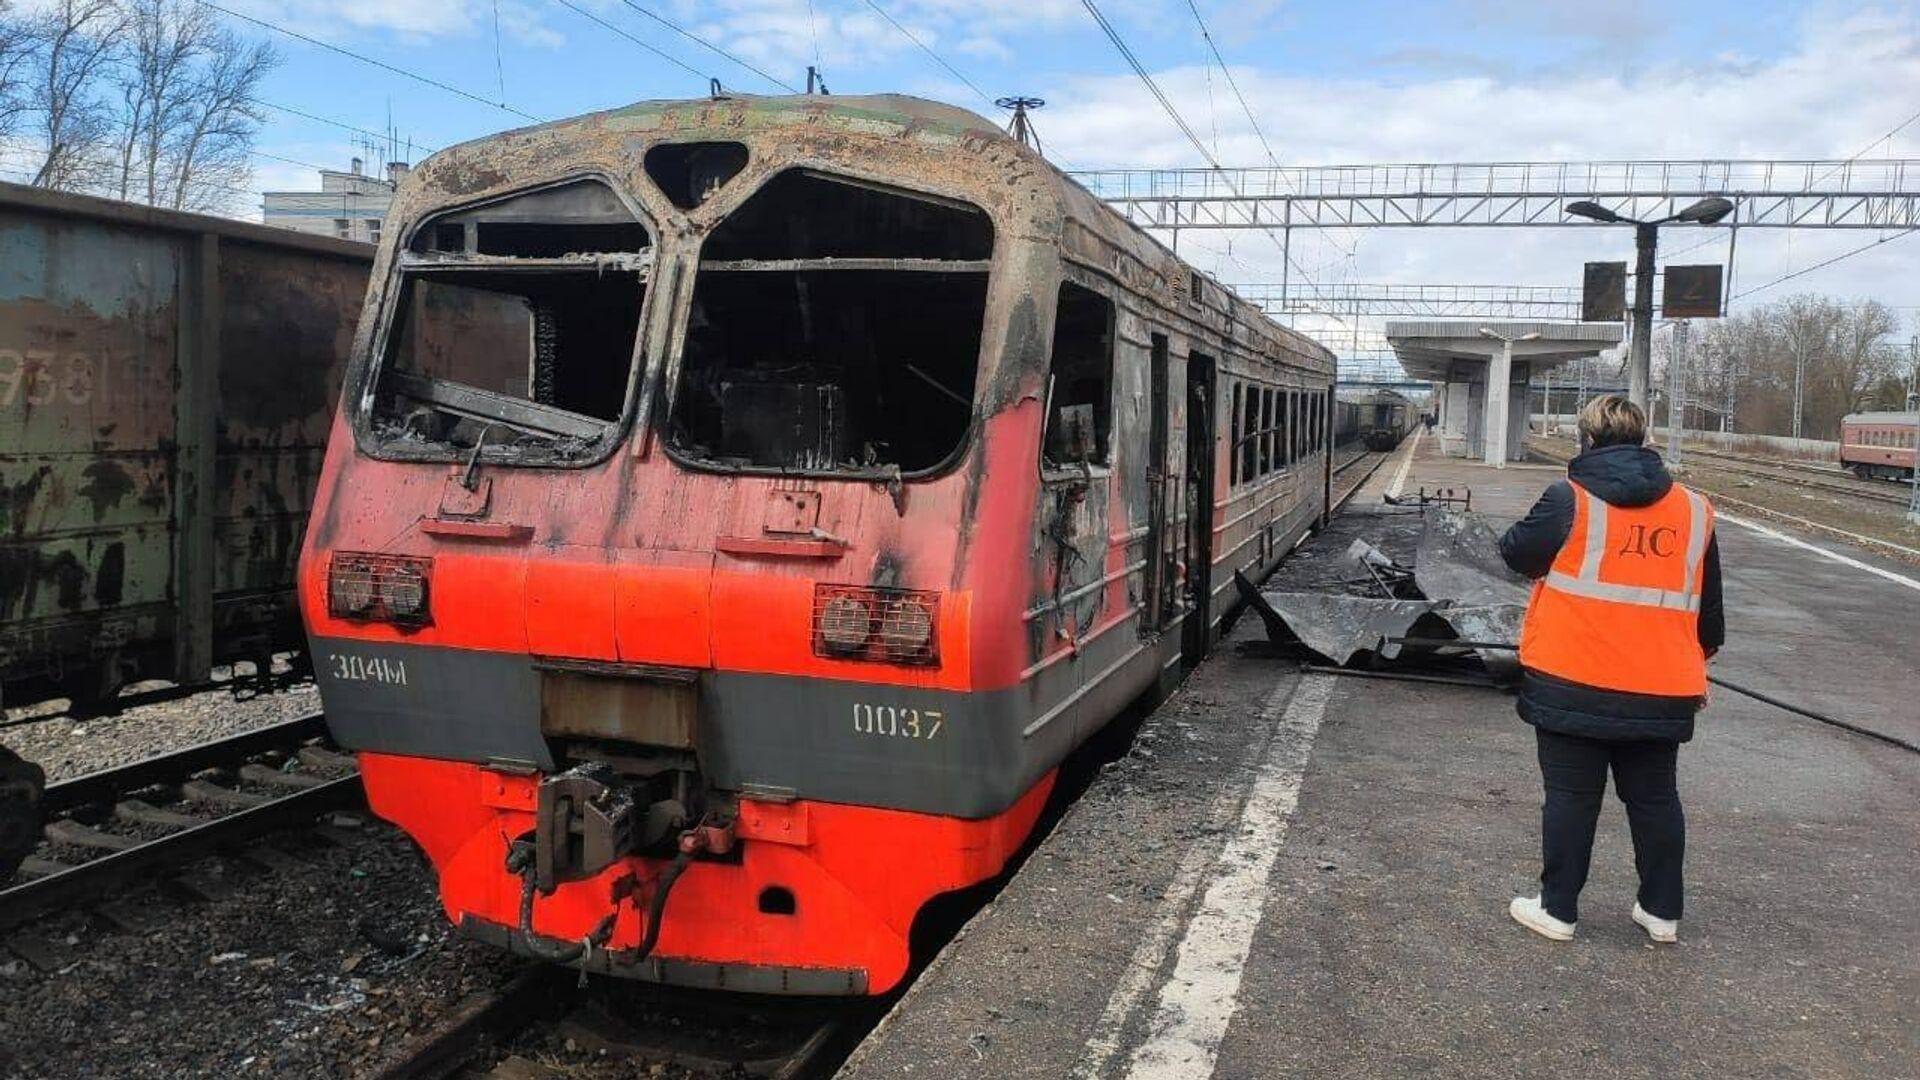 На месте пожара на станции Малоярославец в Калужской области - РИА Новости, 1920, 04.04.2021